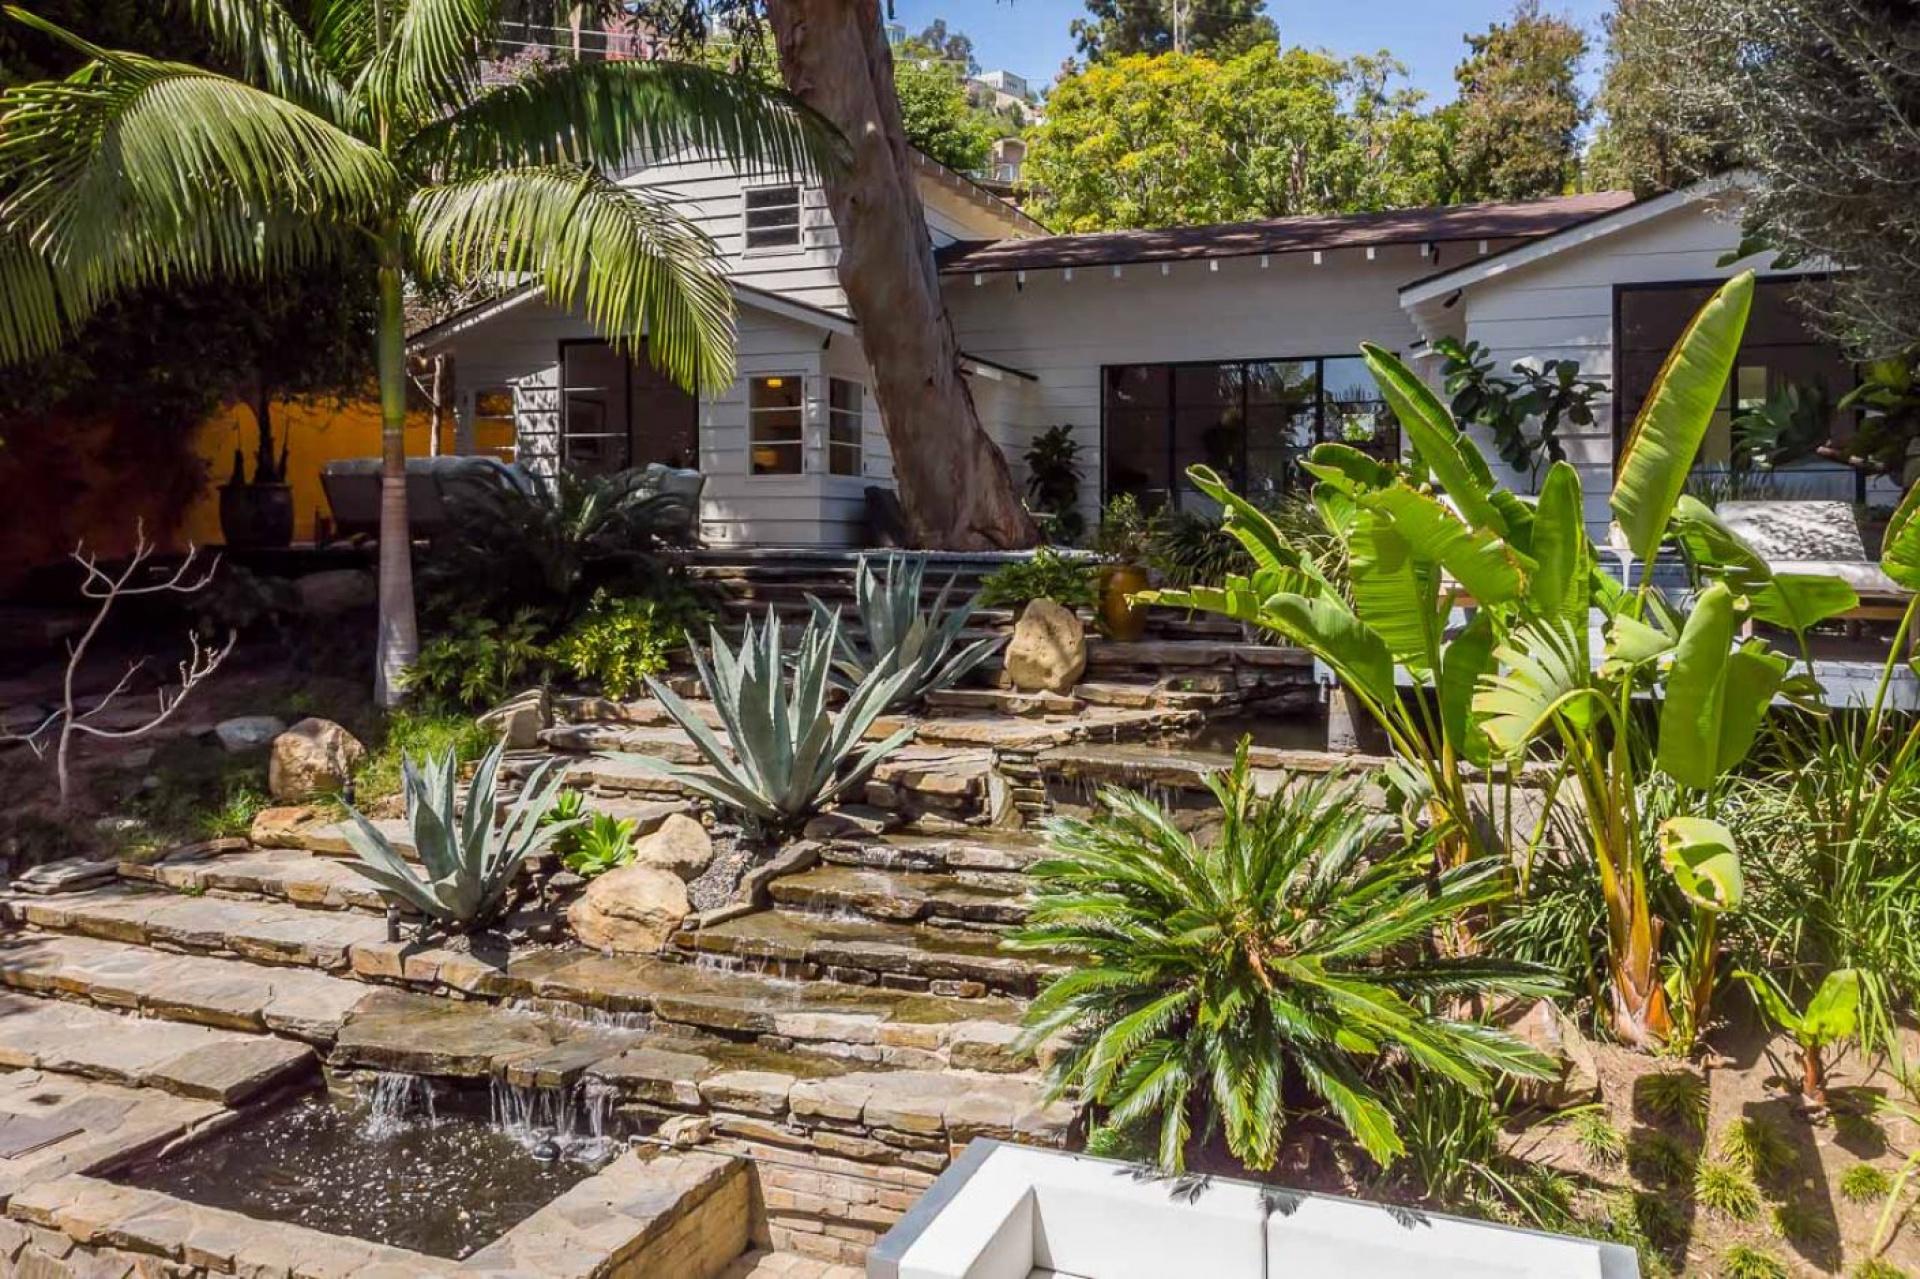 8814 Evanview Drive     |     Sunset Strip Los Angeles CA  | Jonah Wilson